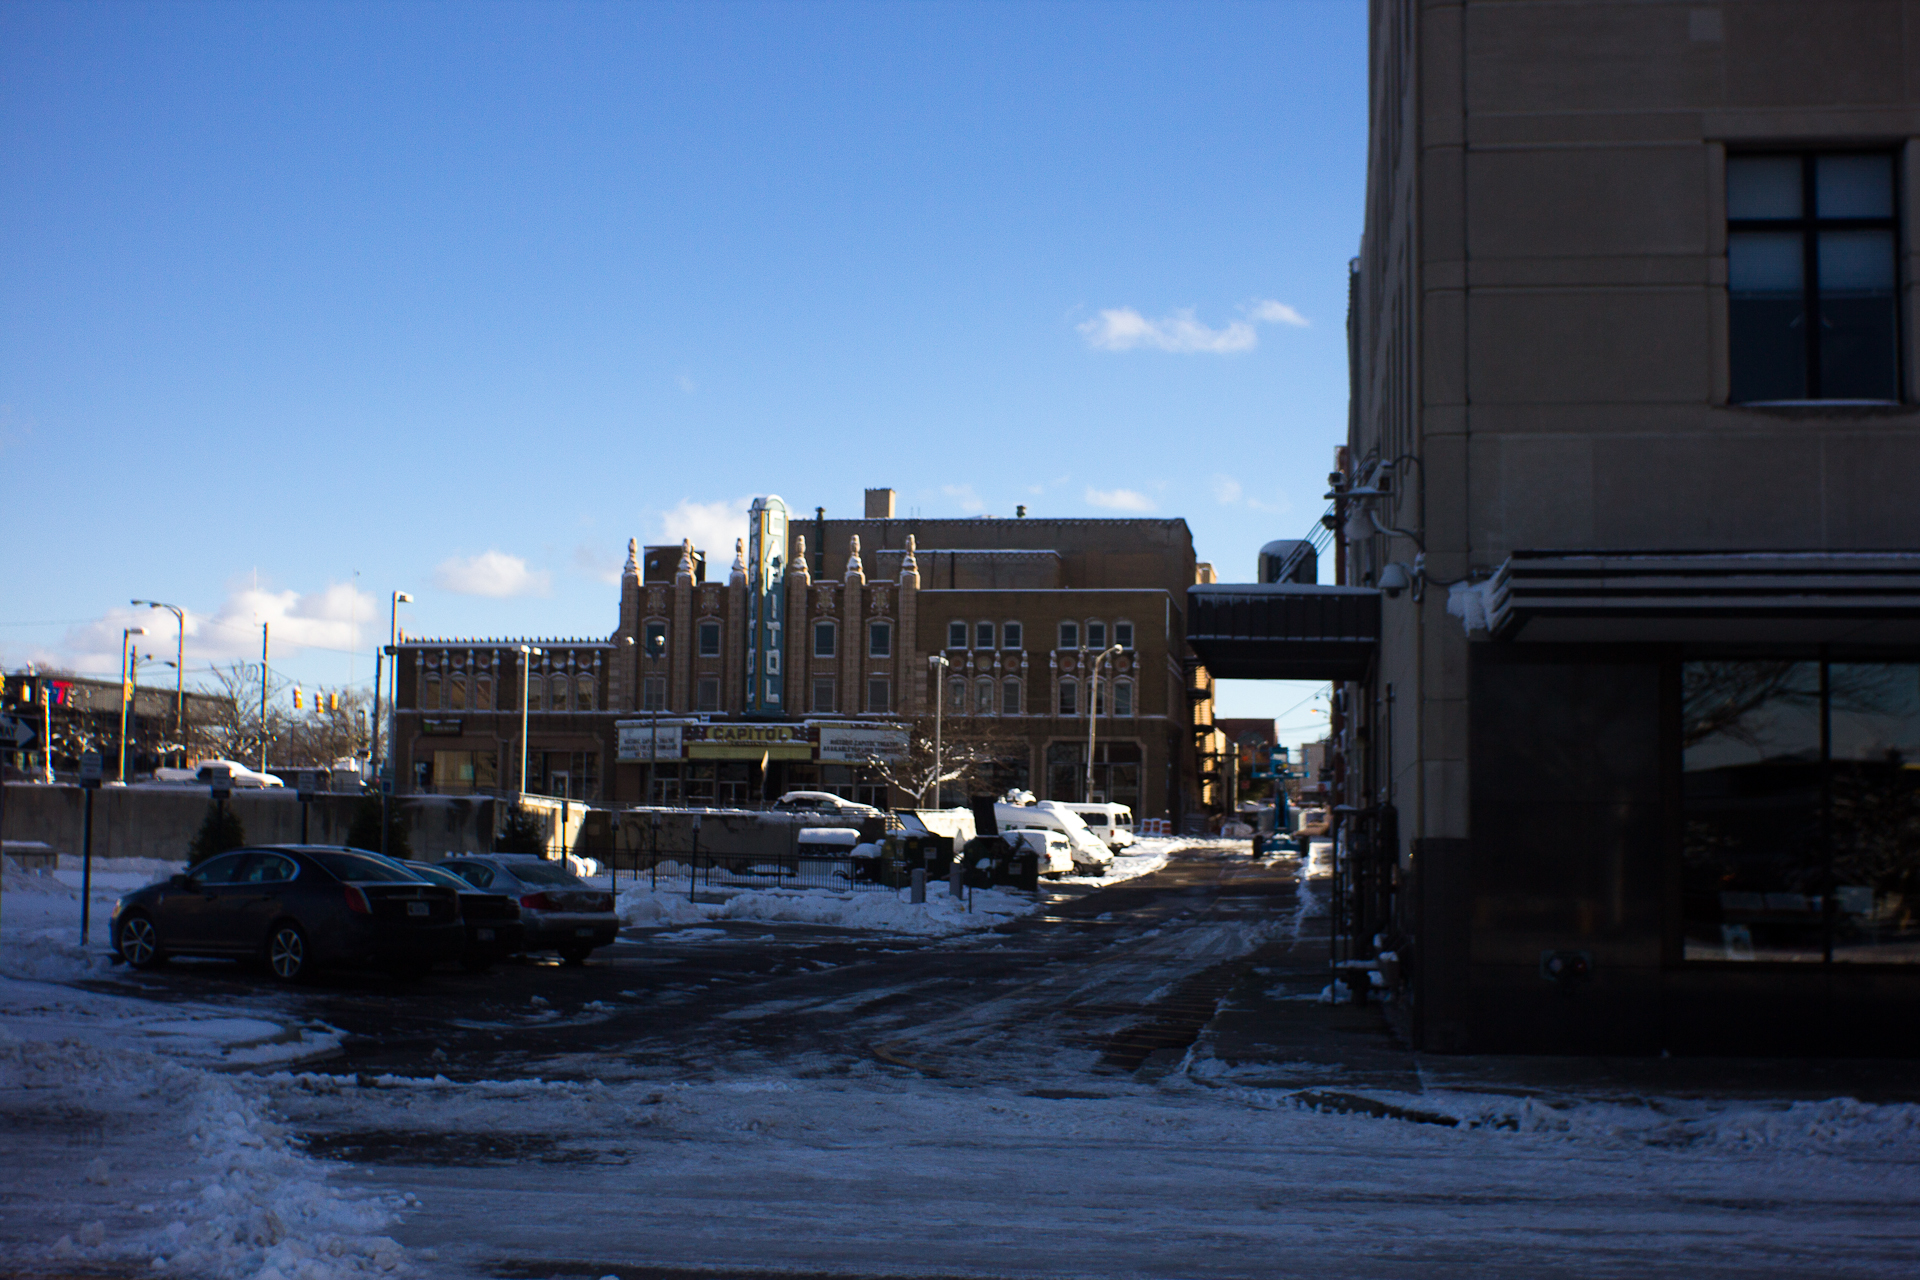 Nov 22 Downtown Flint Life photos Web-4.jpg